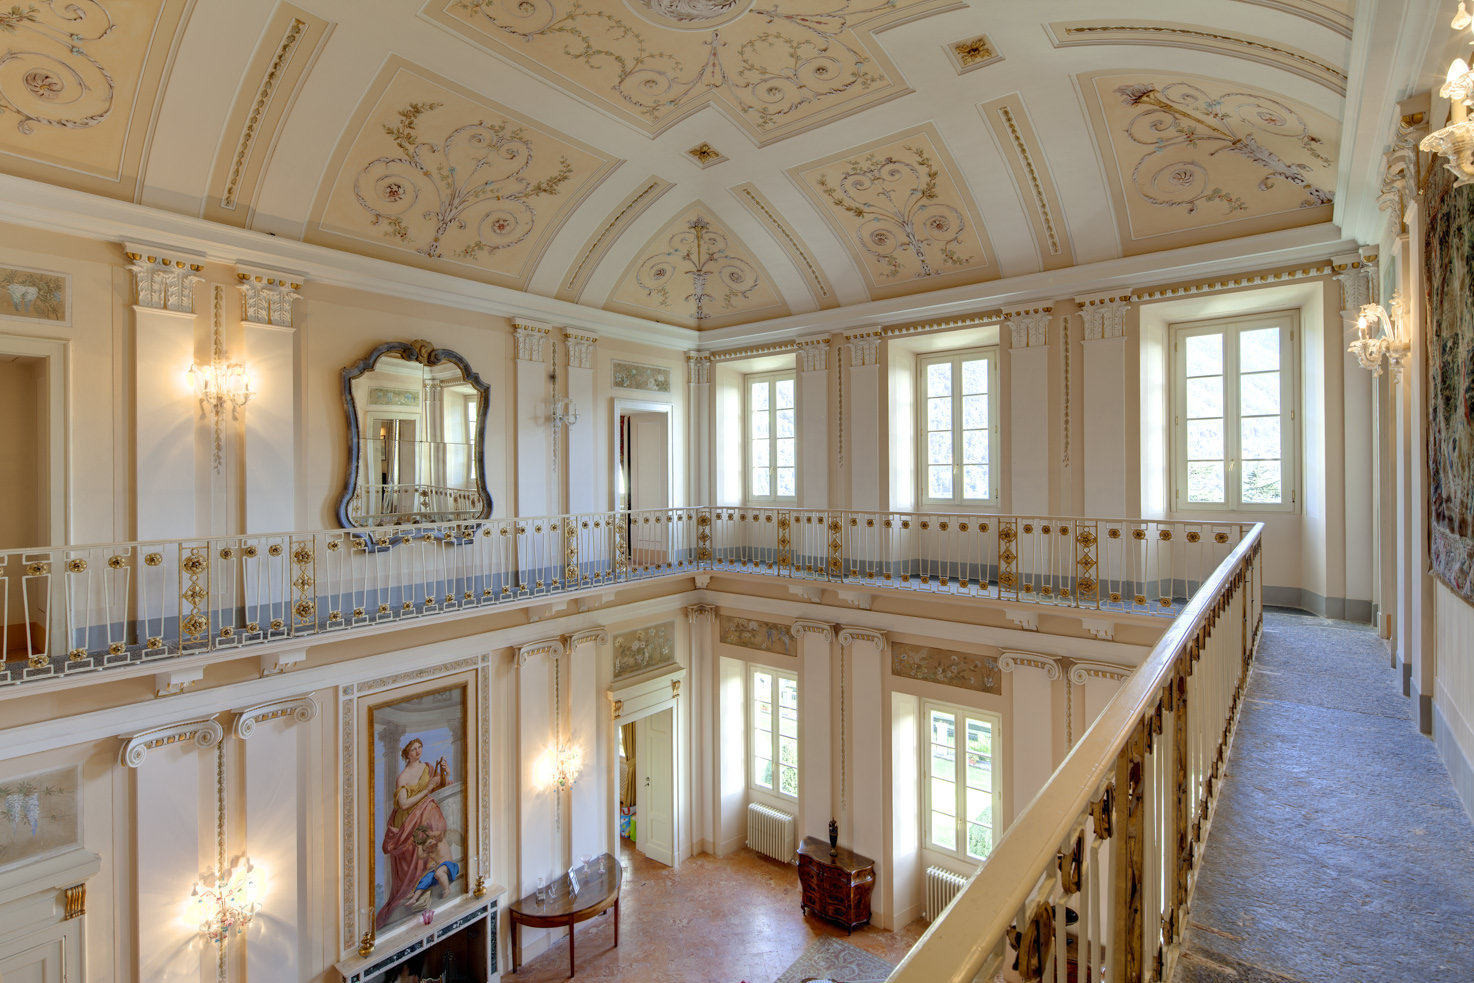 Balcony of music room